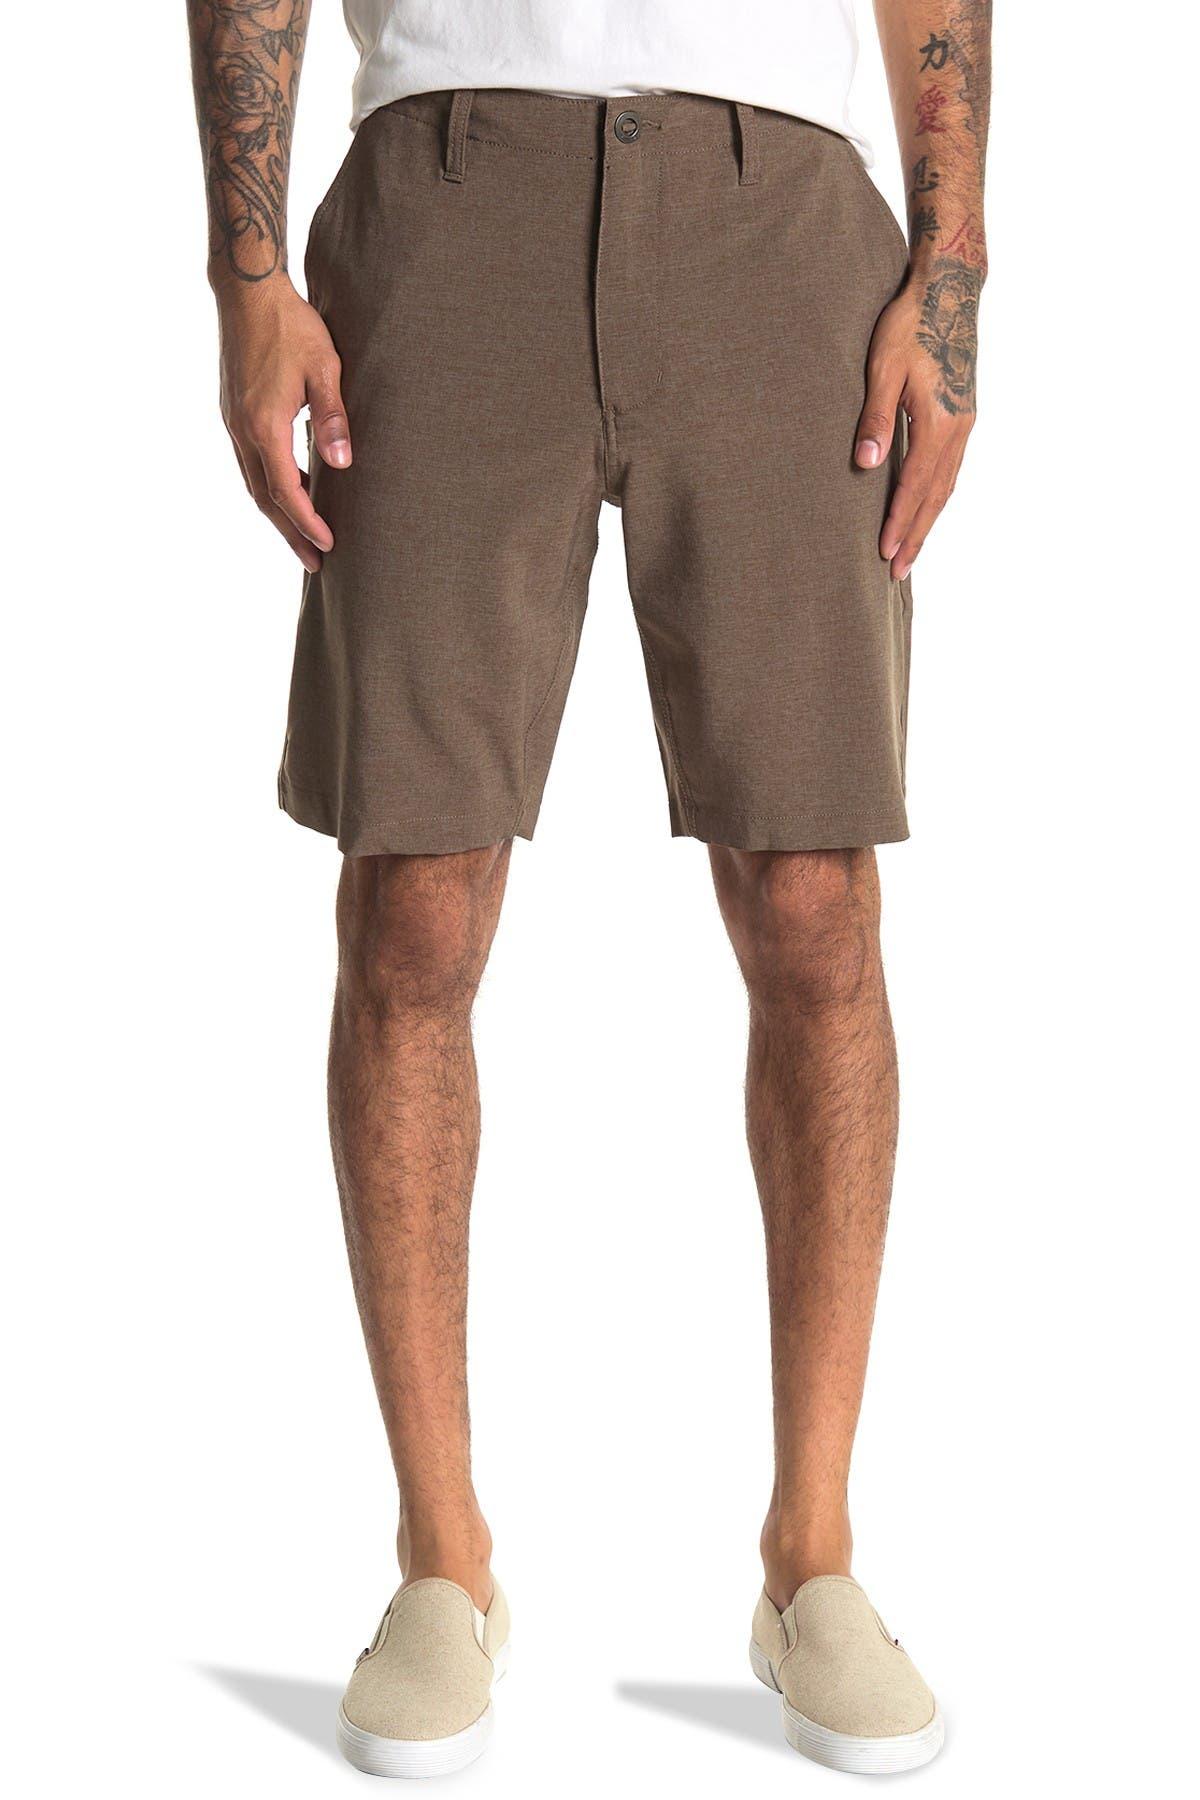 Image of Volcom Kerosene Hybrid Shorts